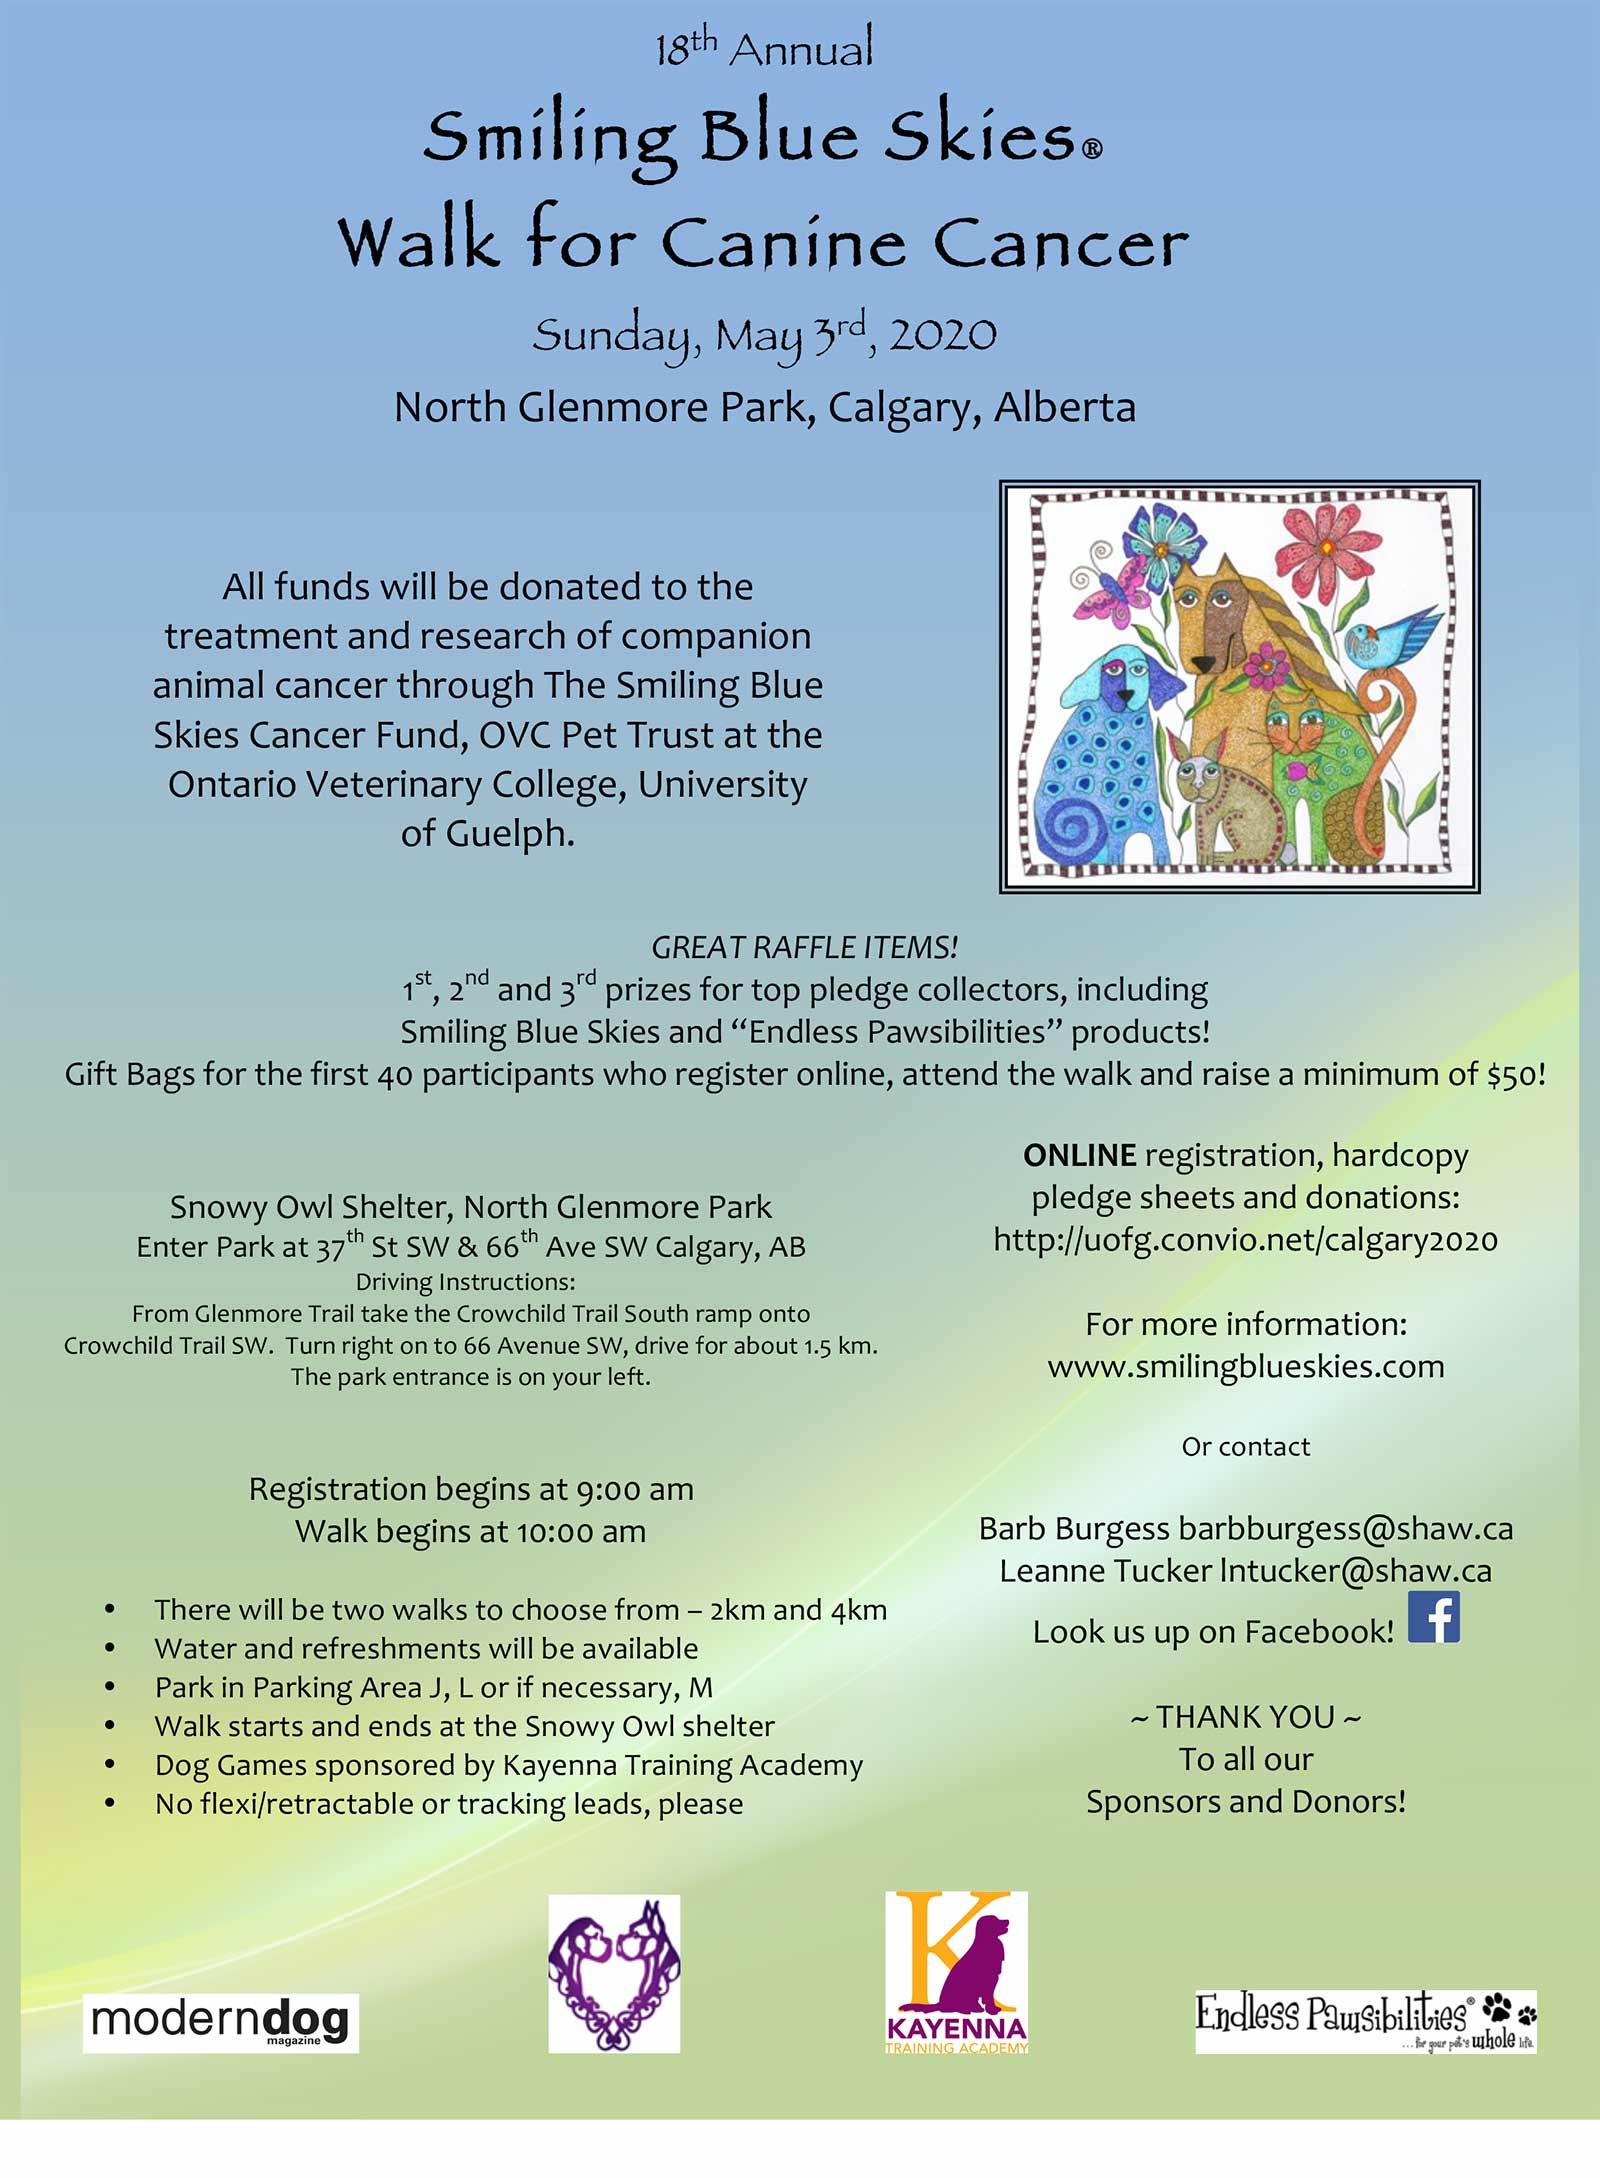 Walk for Canine Cancer - Calgary 03/05/2020